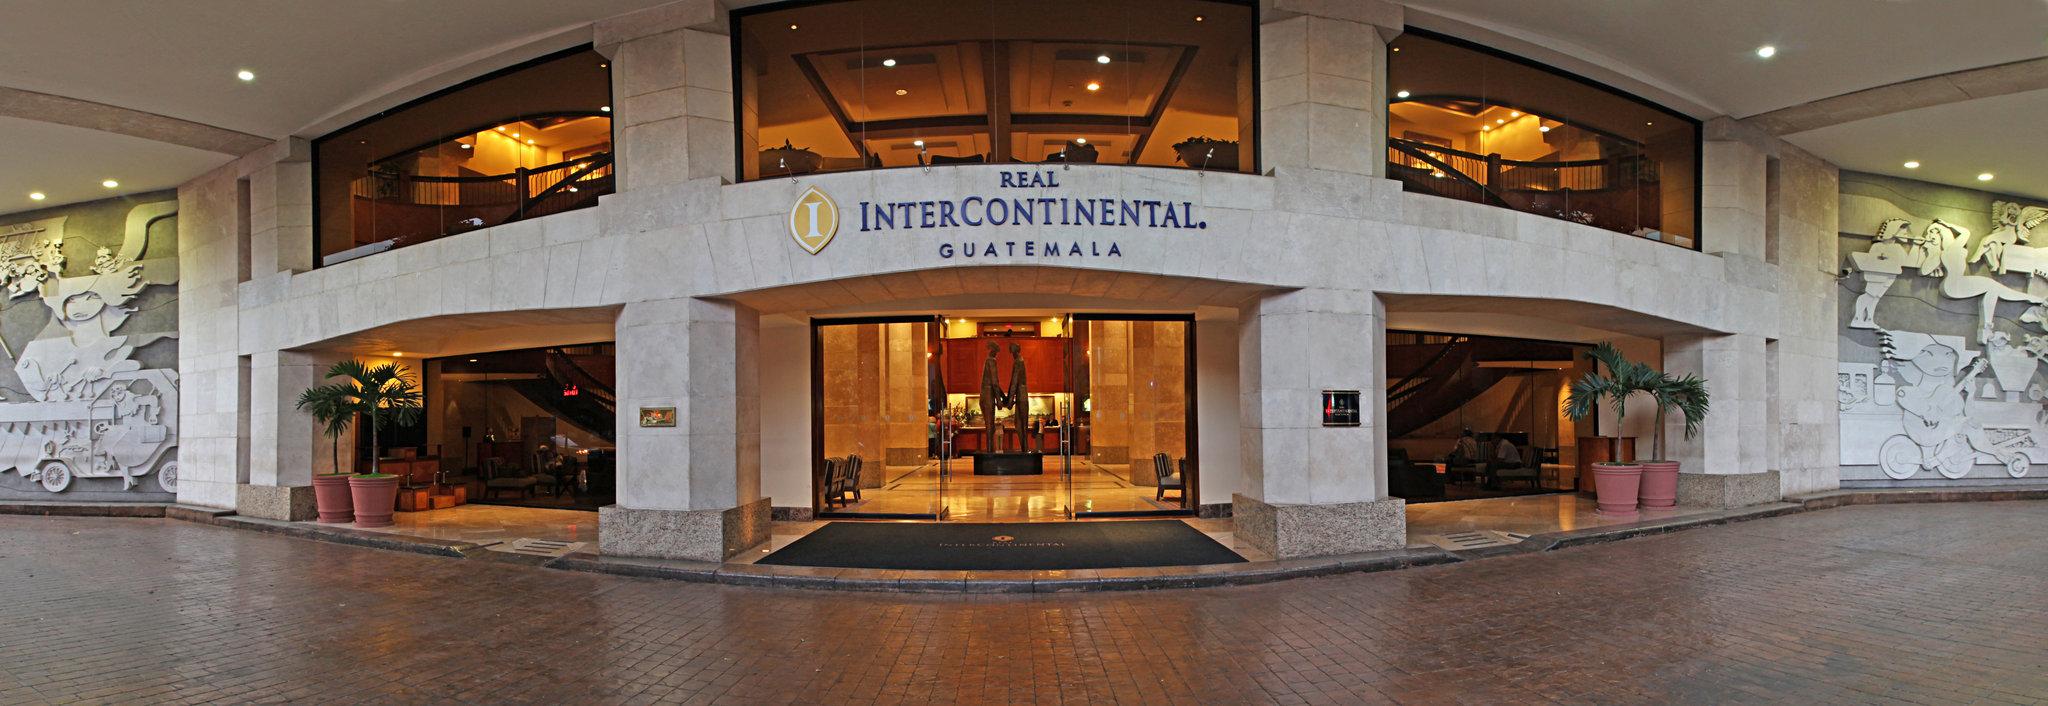 InterContinental Real Guatemala